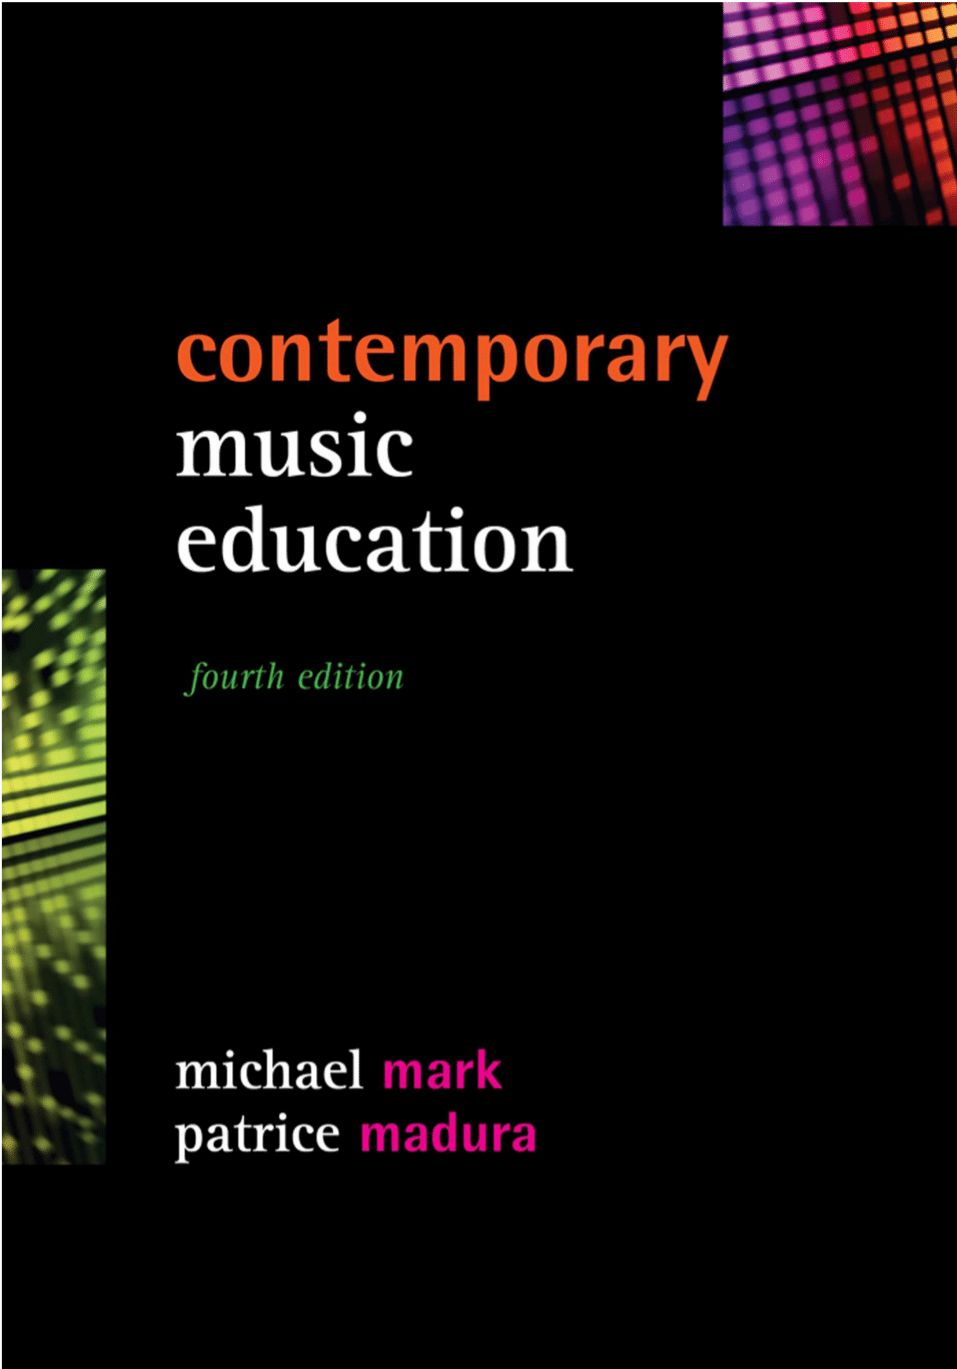 interdisciplinary elementary physical education essay